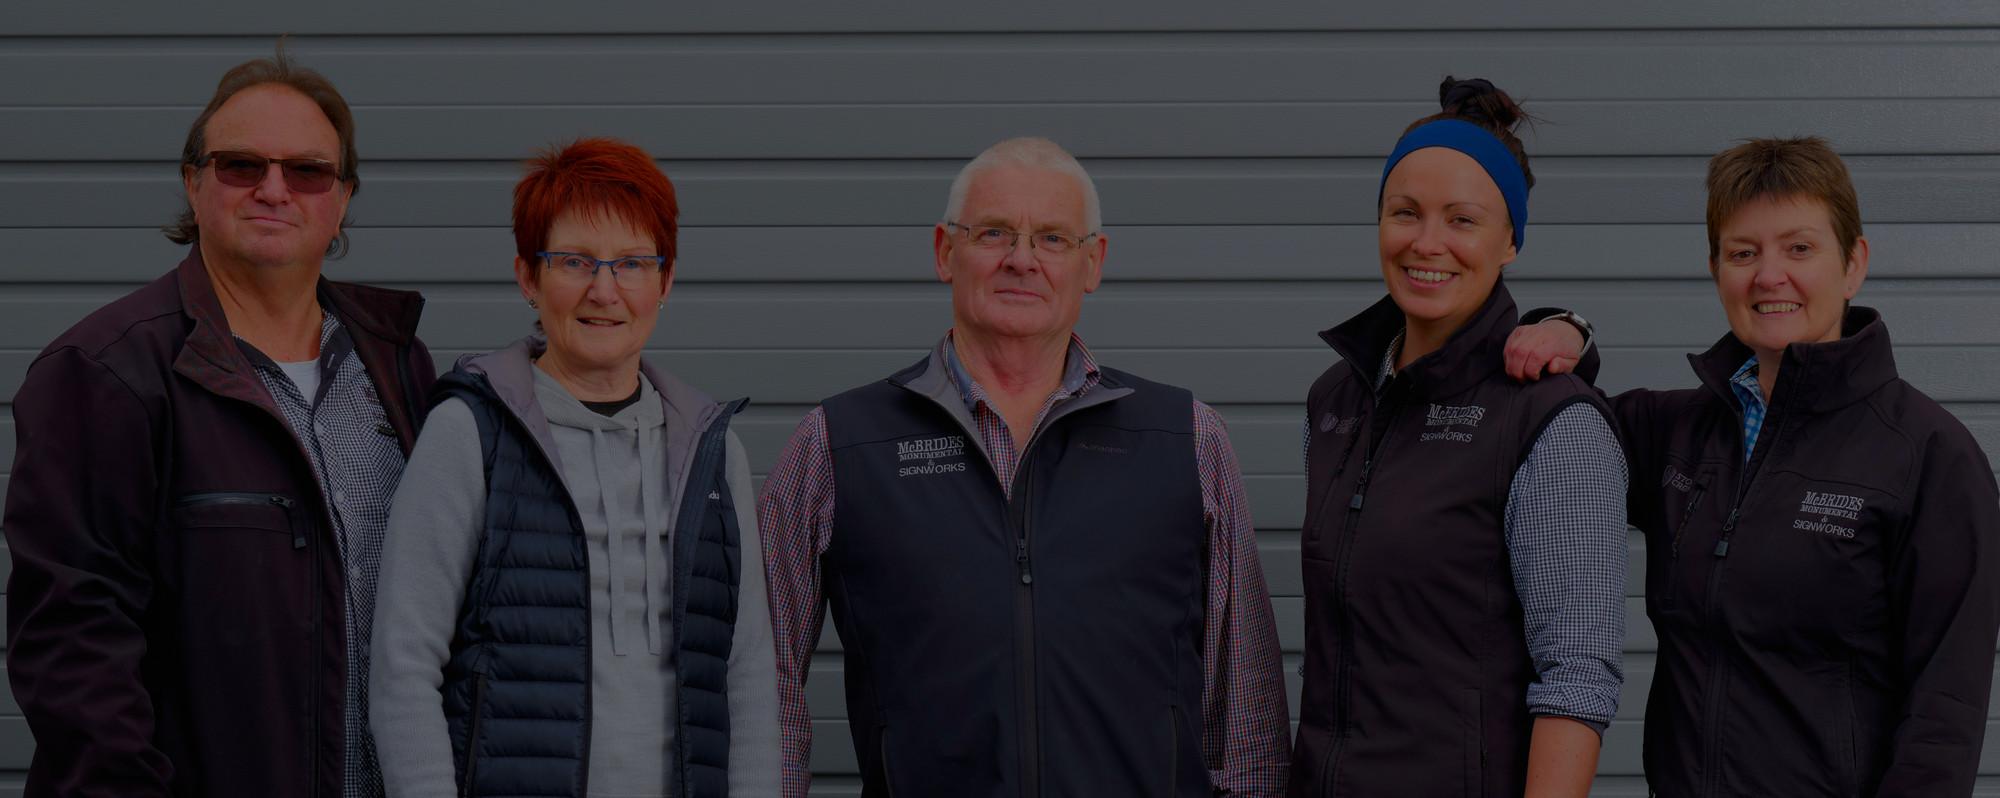 Signworks South Otago Team Photo